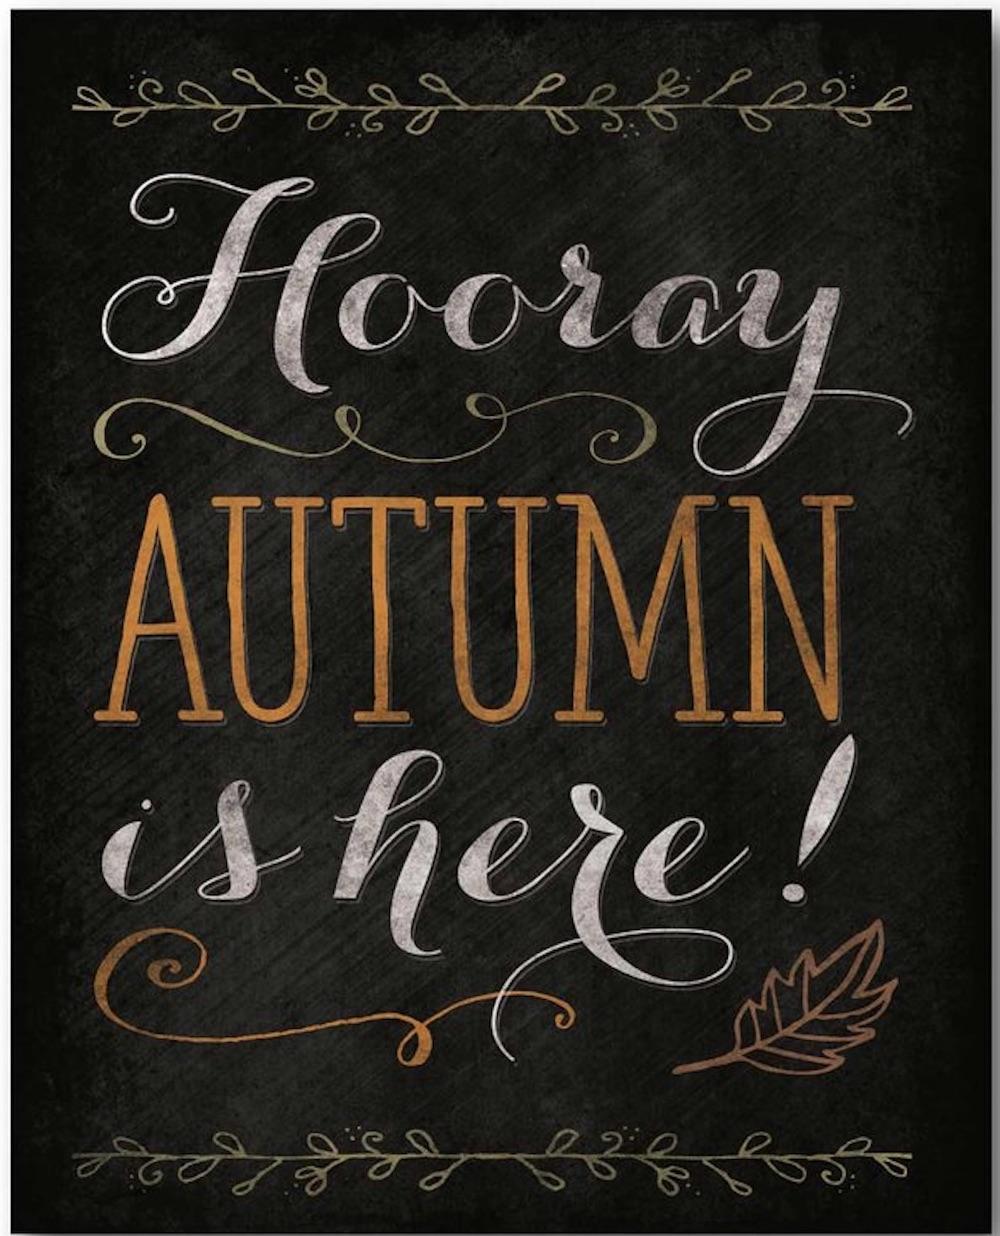 Farmhouse Fall Wall Decor to Welcome Autumn Autumns Textual Art #Farmhouse #FallWallDecor #FarmhouseWallDecor #RusticDecor #CountryDecor #FallDecor #AutumnDecor #FallWallArt